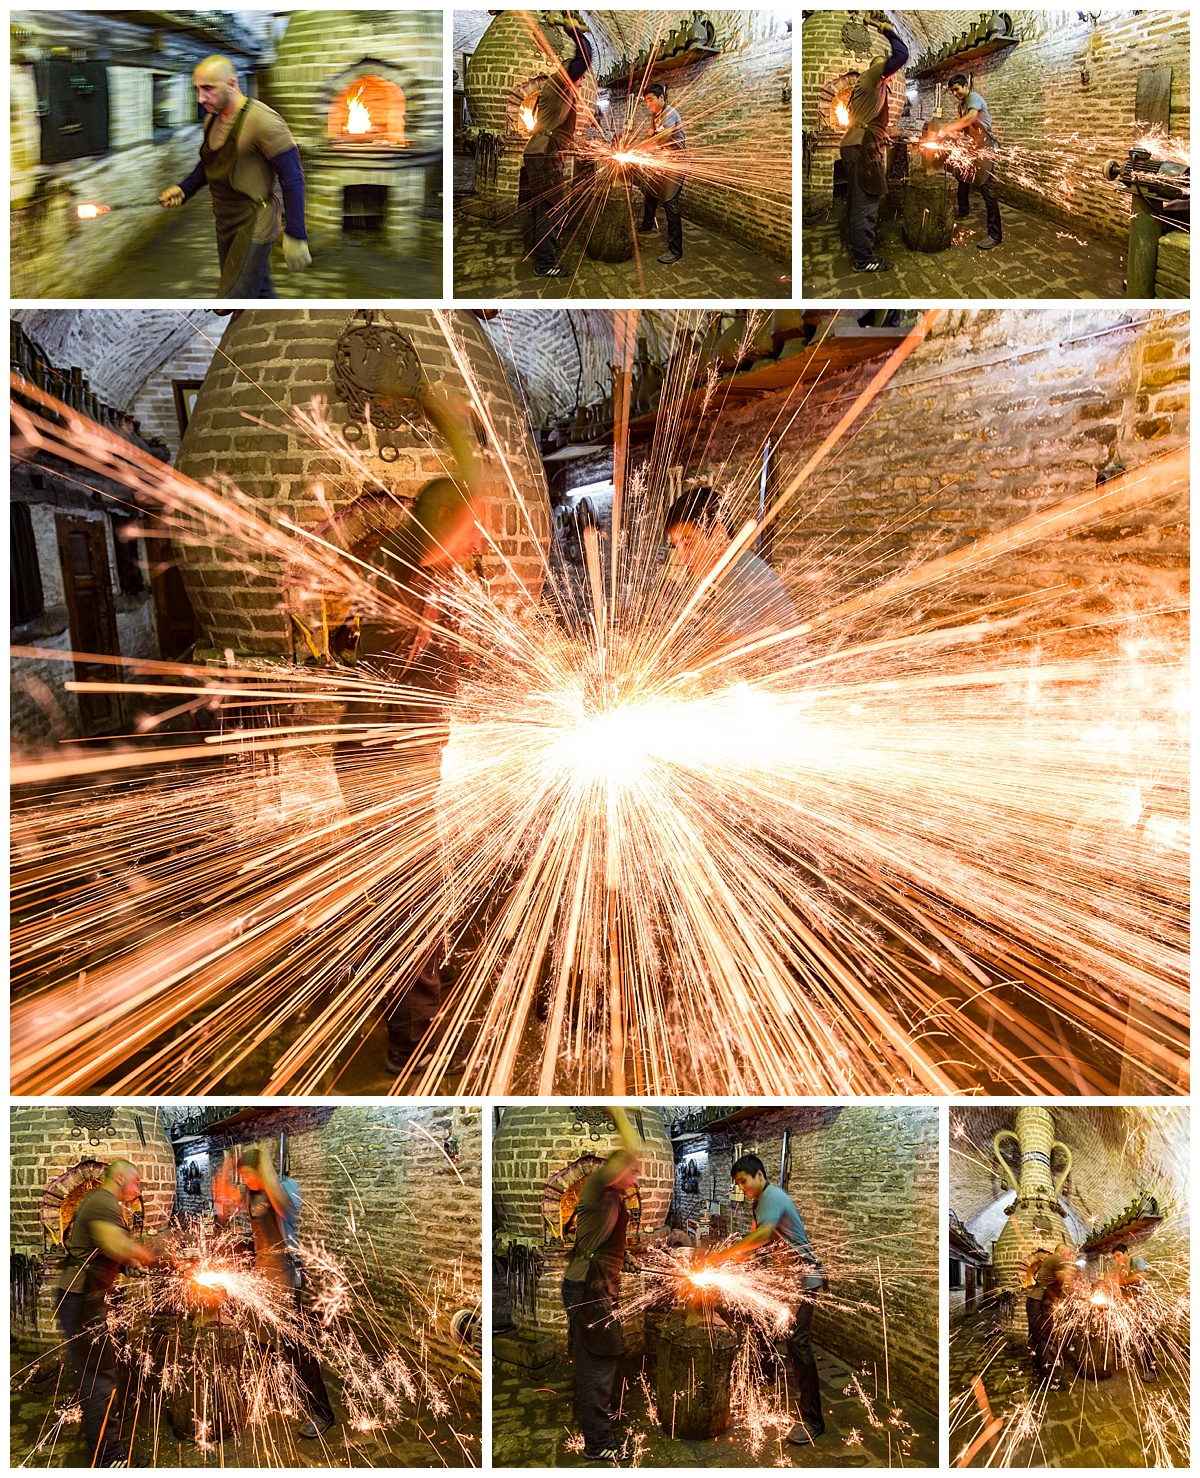 Bukhara, Uzbekistan - blacksmith